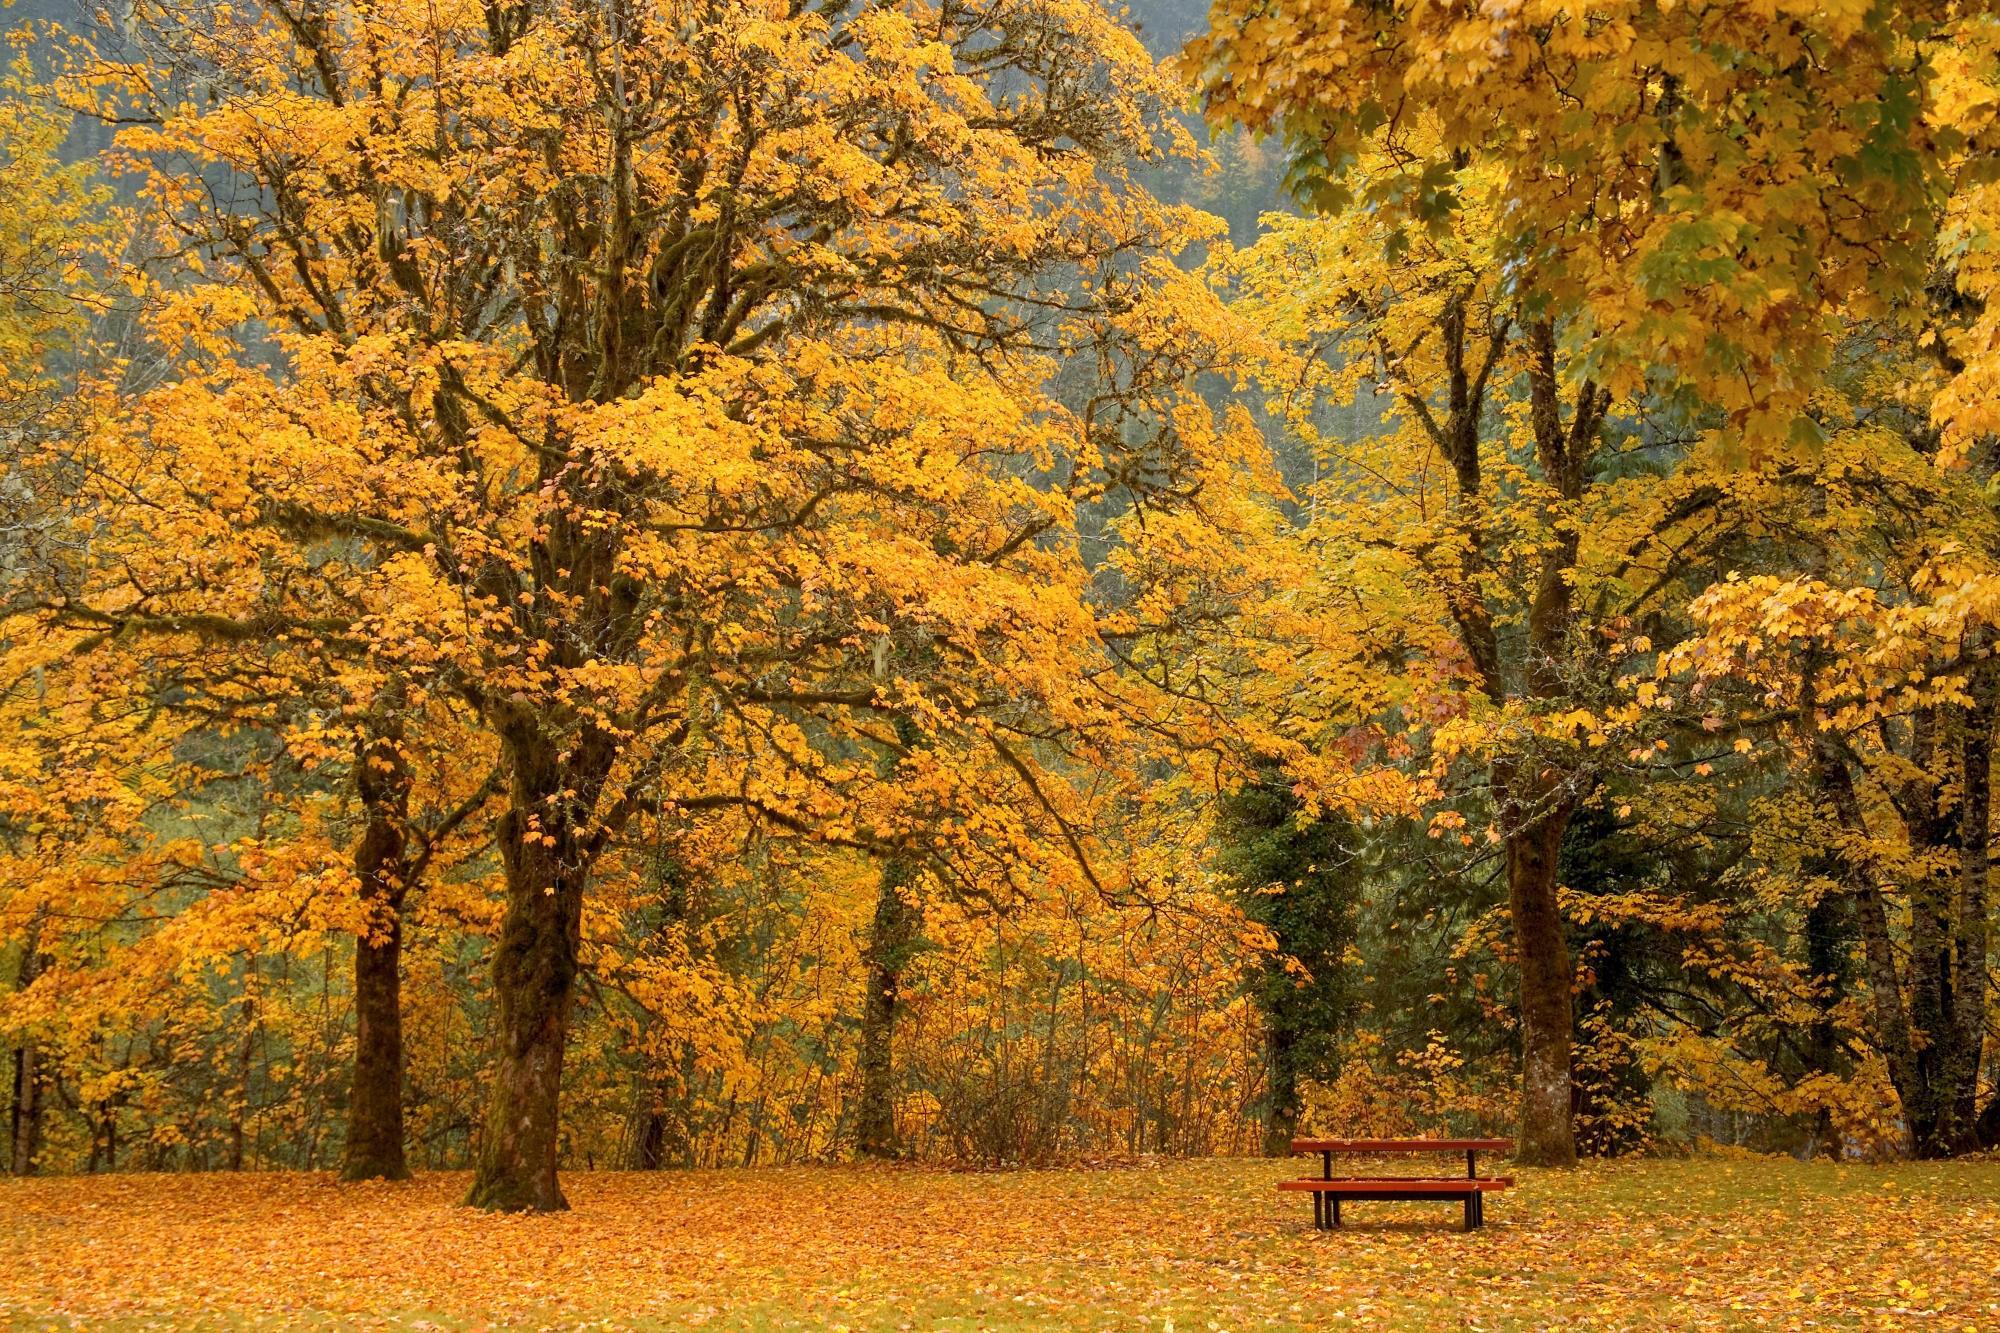 Sunlight Fall Branch Yellow Bench Oak Trees Tree Autumn Leaf Plant Season Woodland Grove Land